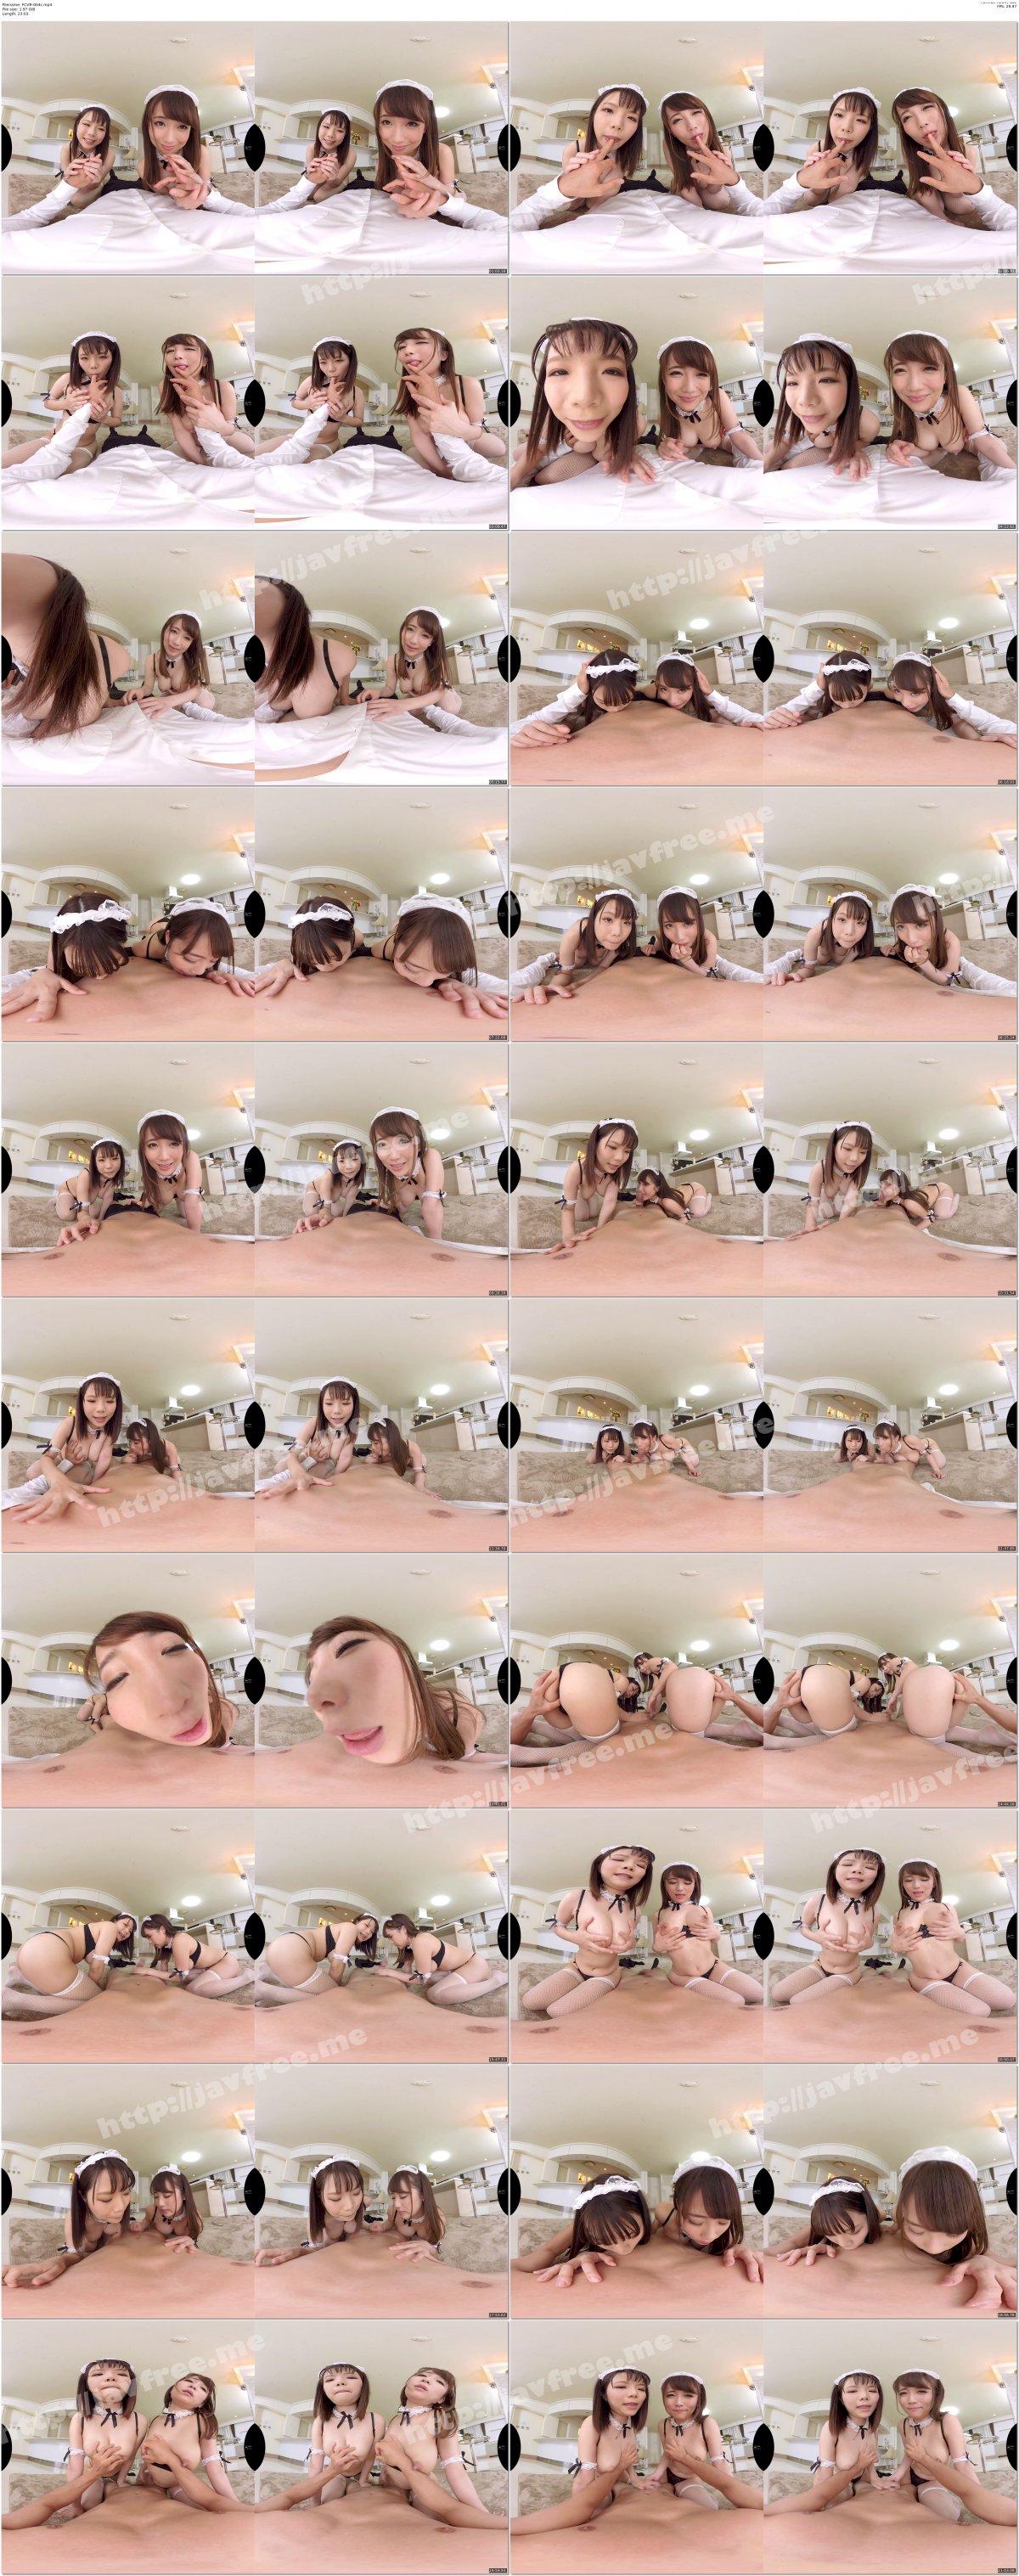 [FCVR-004] 【VR】Fitch肉感VR 夢のW爆乳子作りメイドと3P性活! ご主人様のおチ○ポミルクを取り合い爆乳を押し付け妊娠したがる発情ボイン!おねだり神乳メイドVR - image FCVR-004c on https://javfree.me